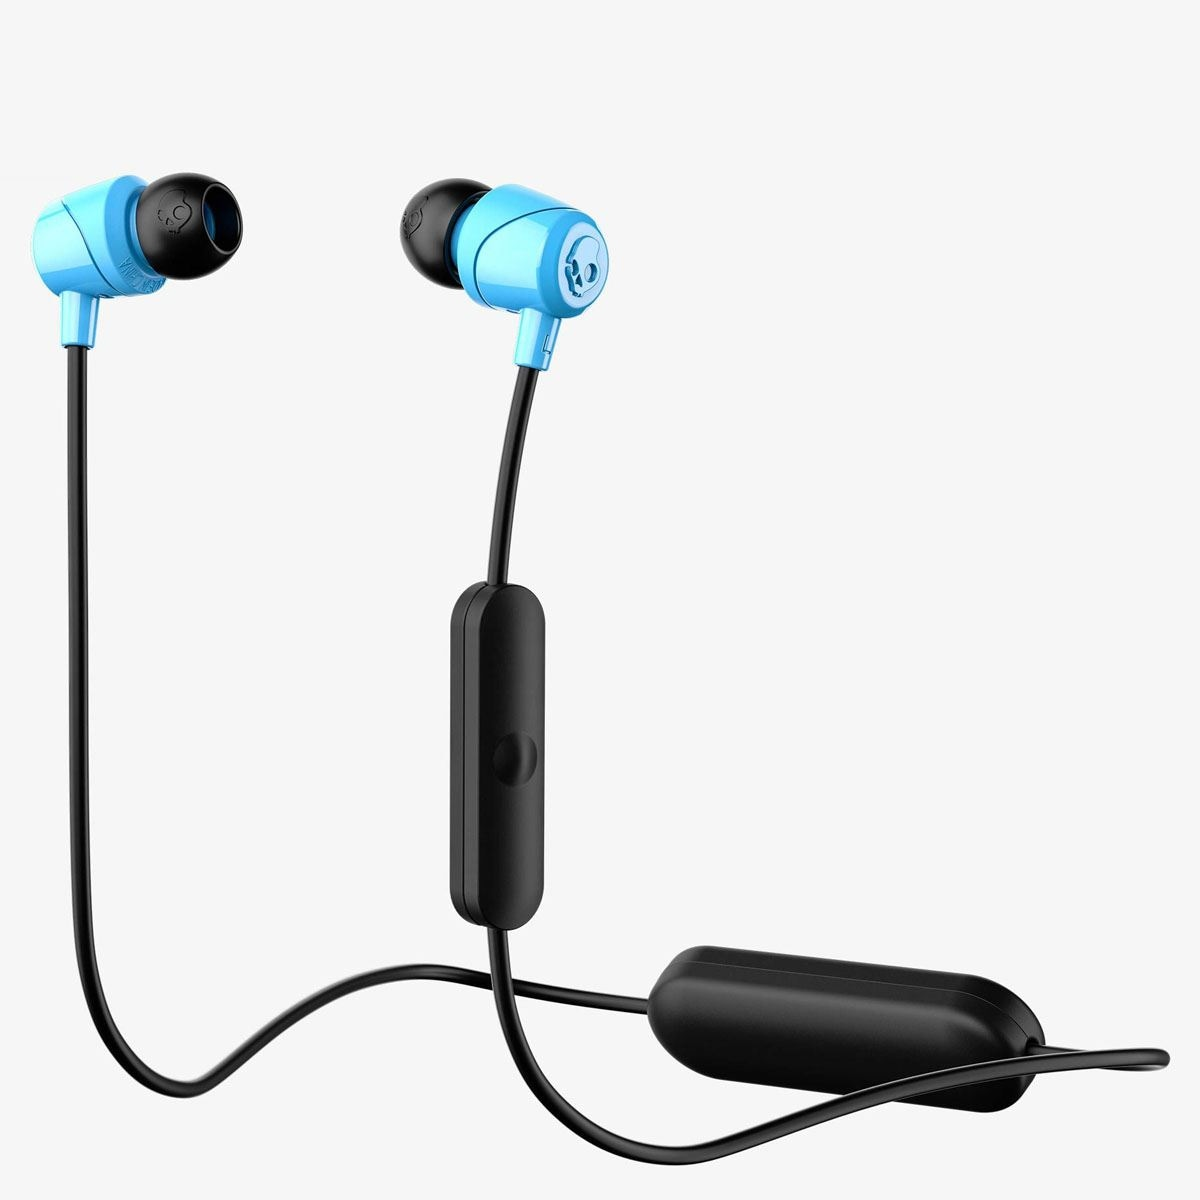 Audífonos Skullcandy JIB Bluetooth Azul